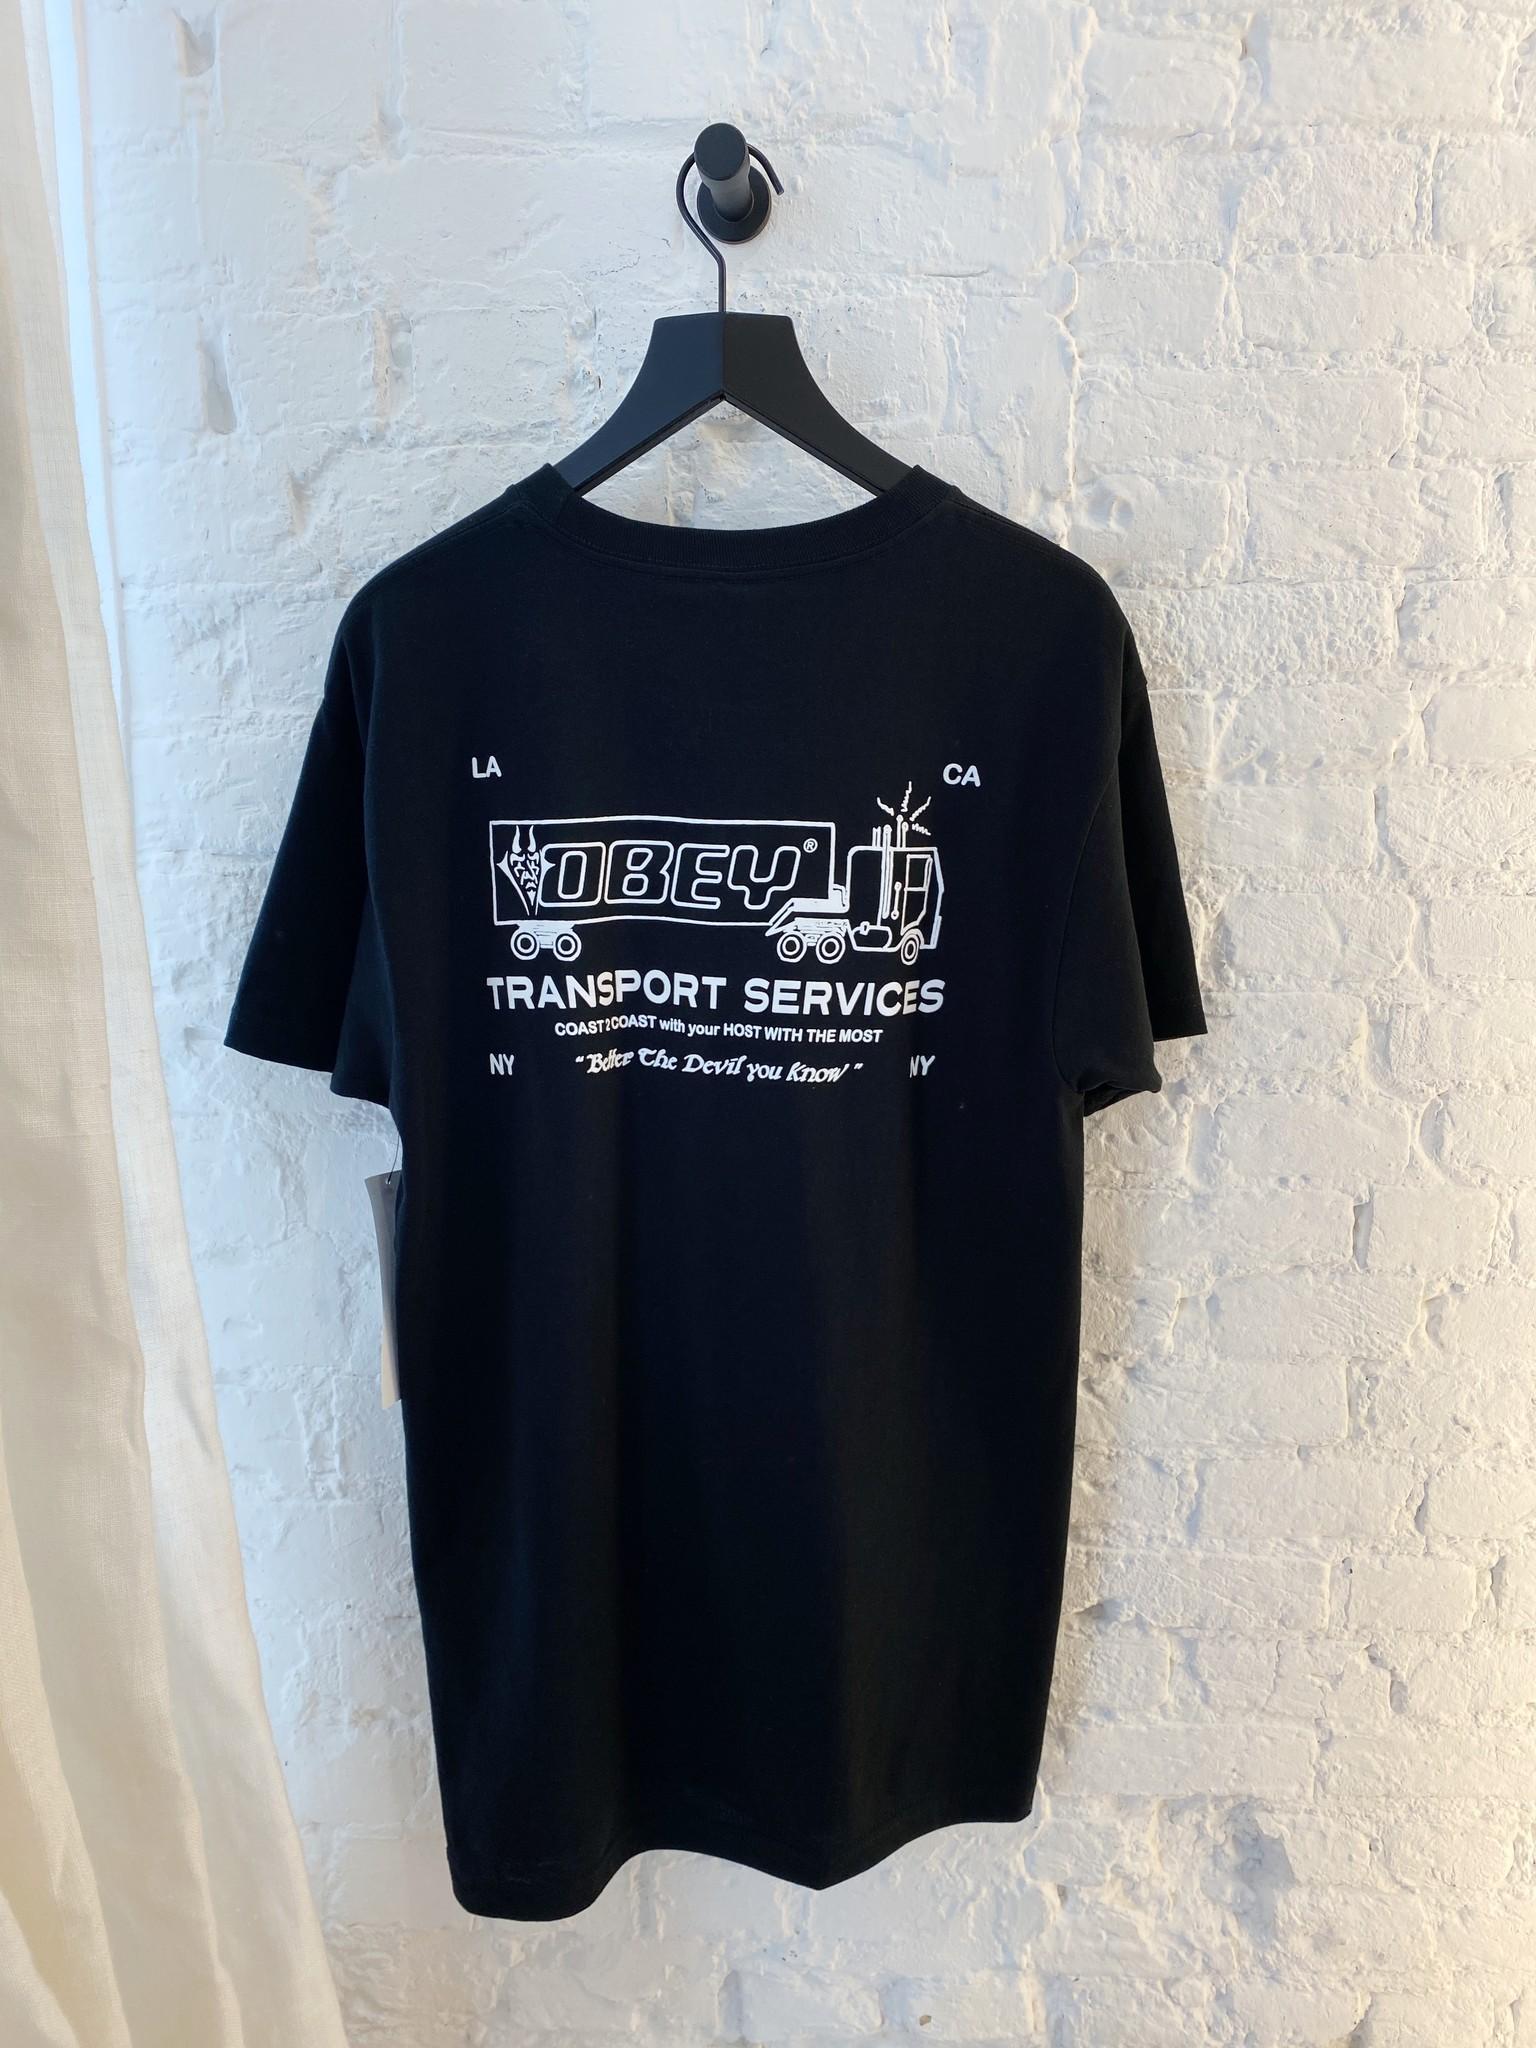 Transport Services T-shirt-2